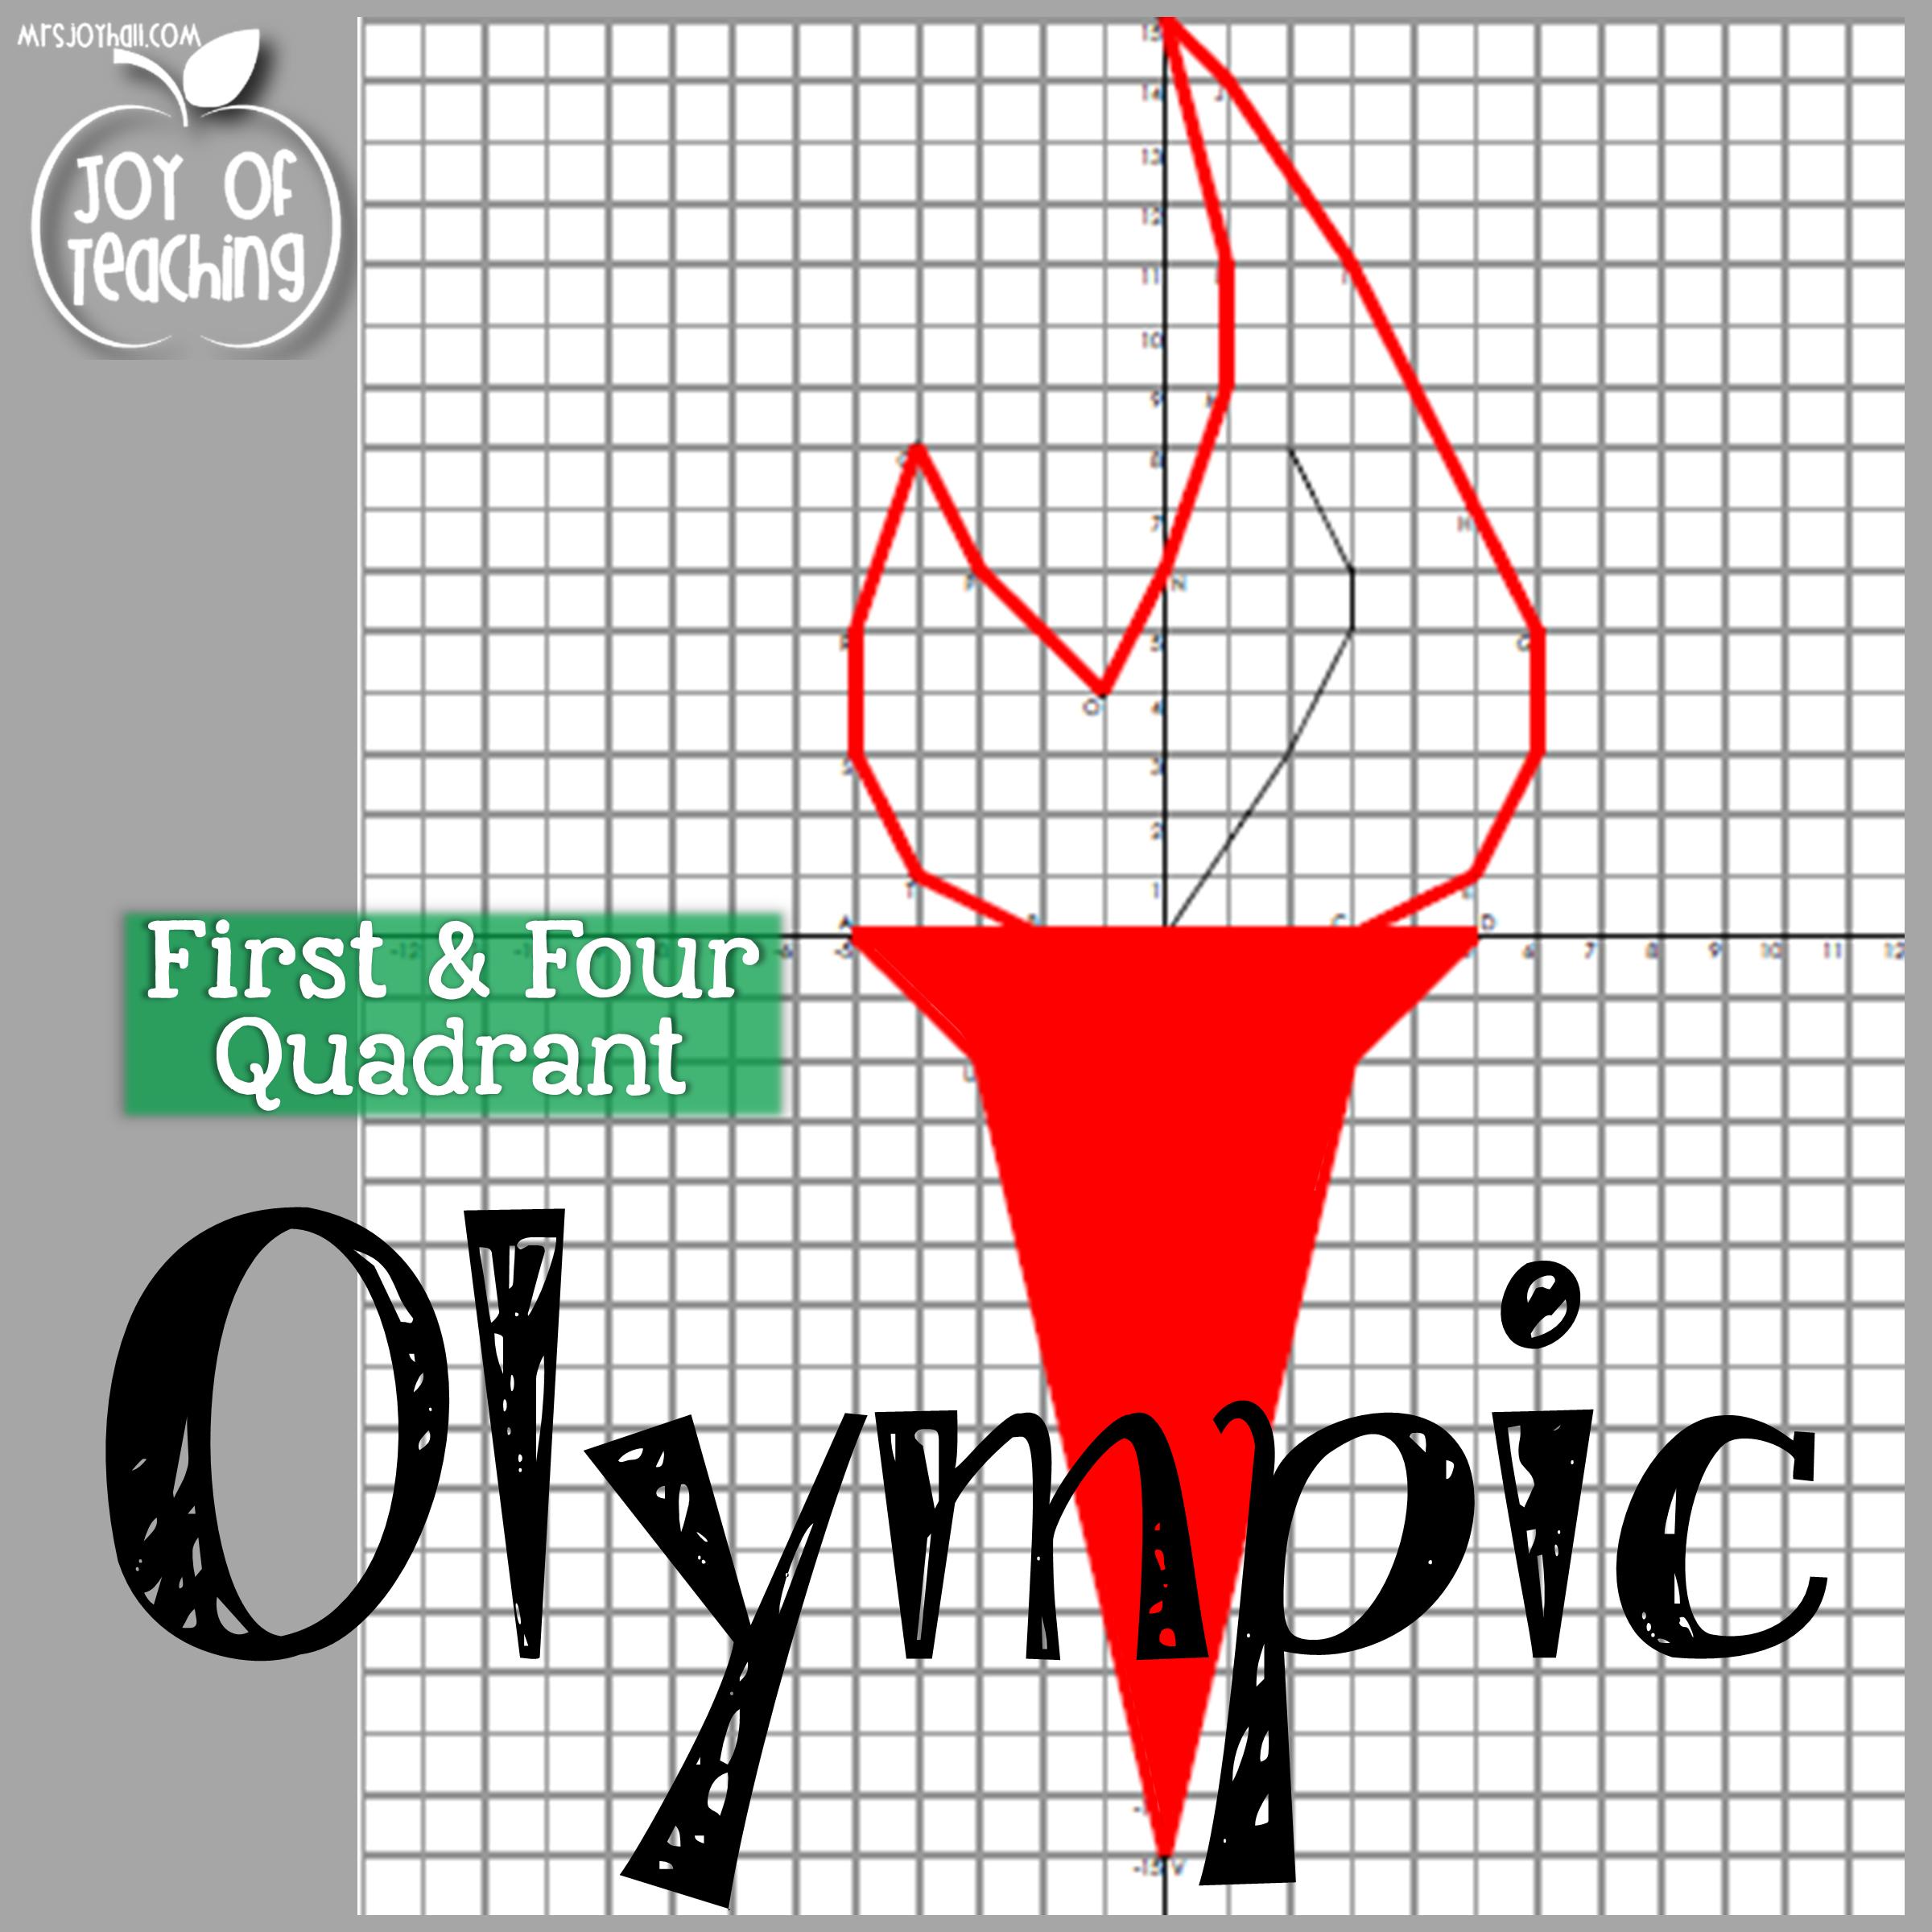 First Amp Four Quadrant Olympic Themed Coordinate Graphing Joy Of Teaching Mrsjoyhall